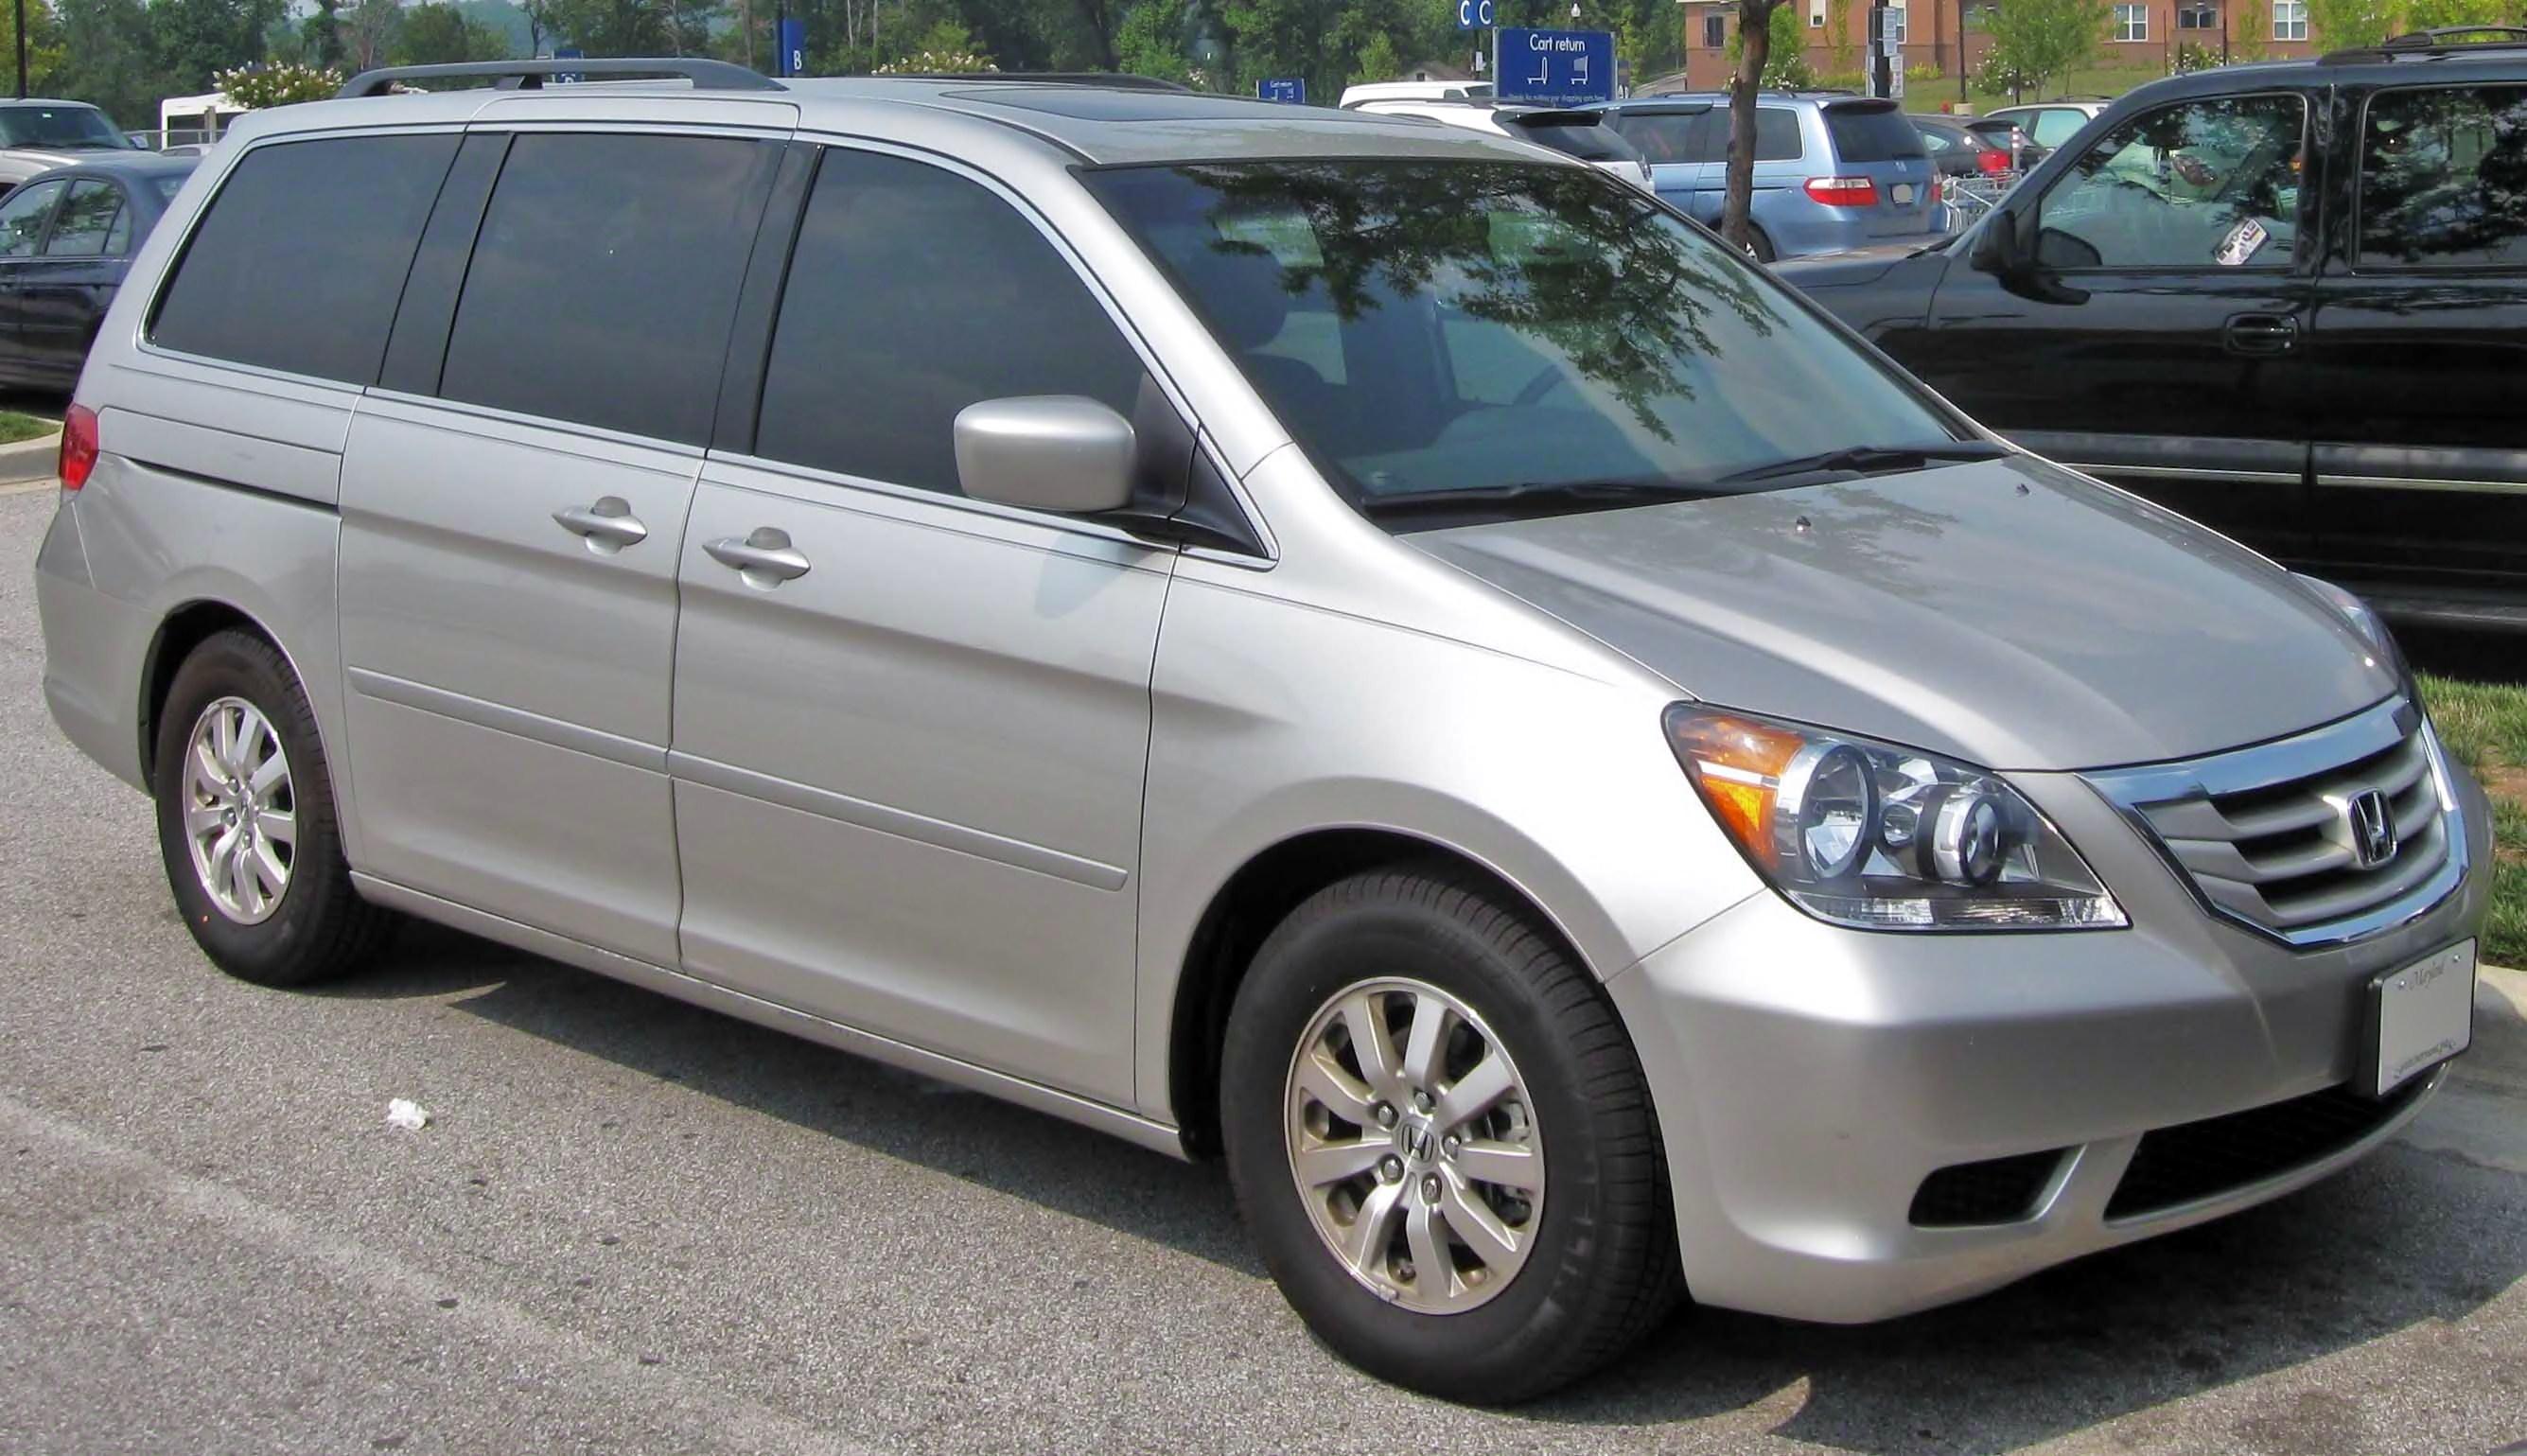 File:2008 Honda Odyssey.jpg - Wikimedia Commons